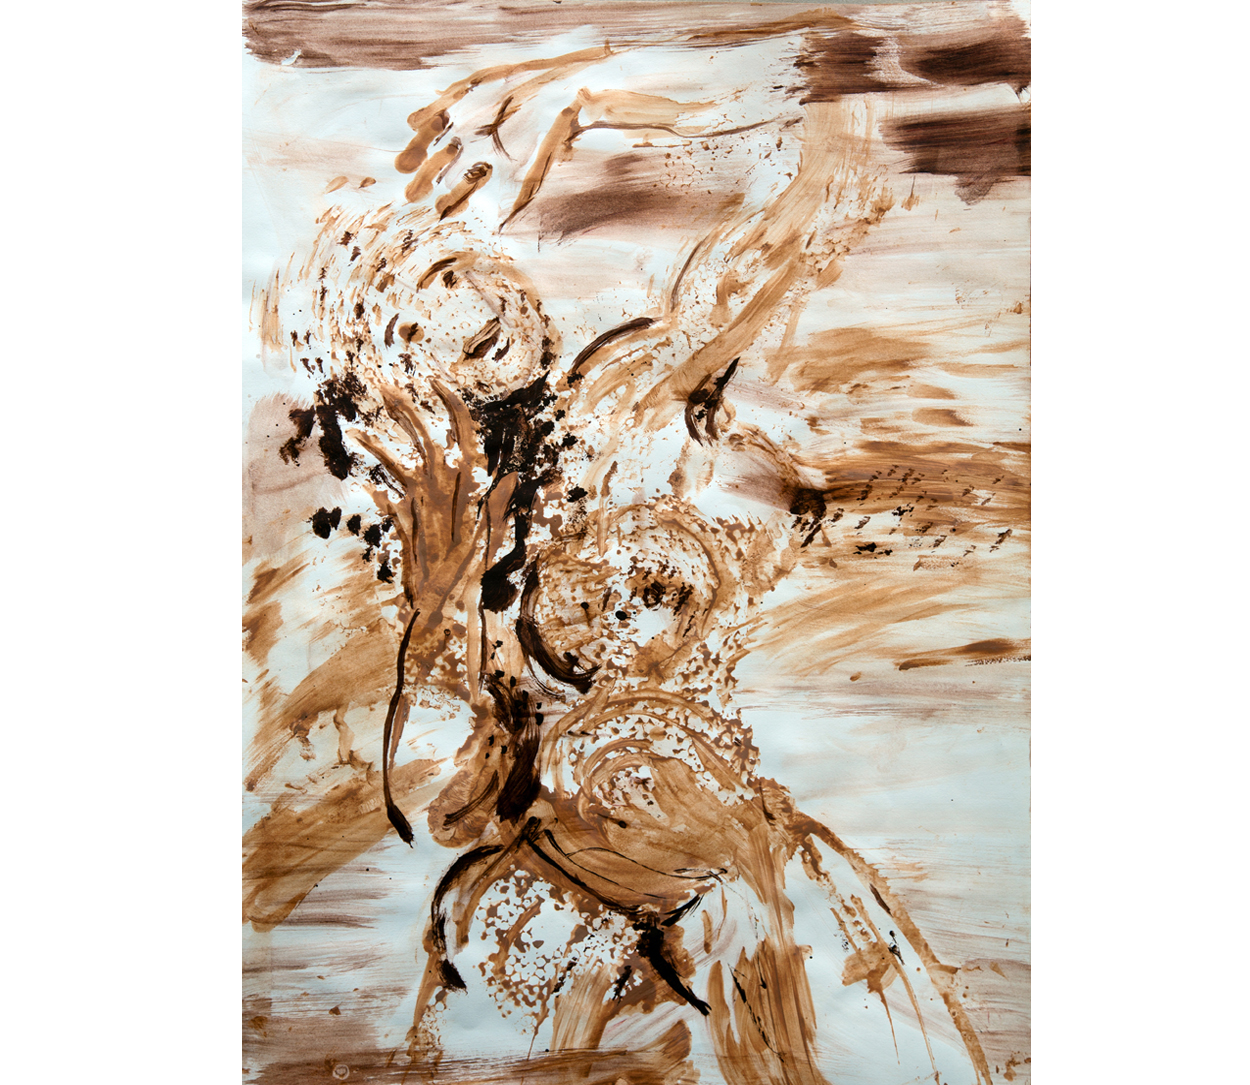 Terra on paper 6, 50x70 cm